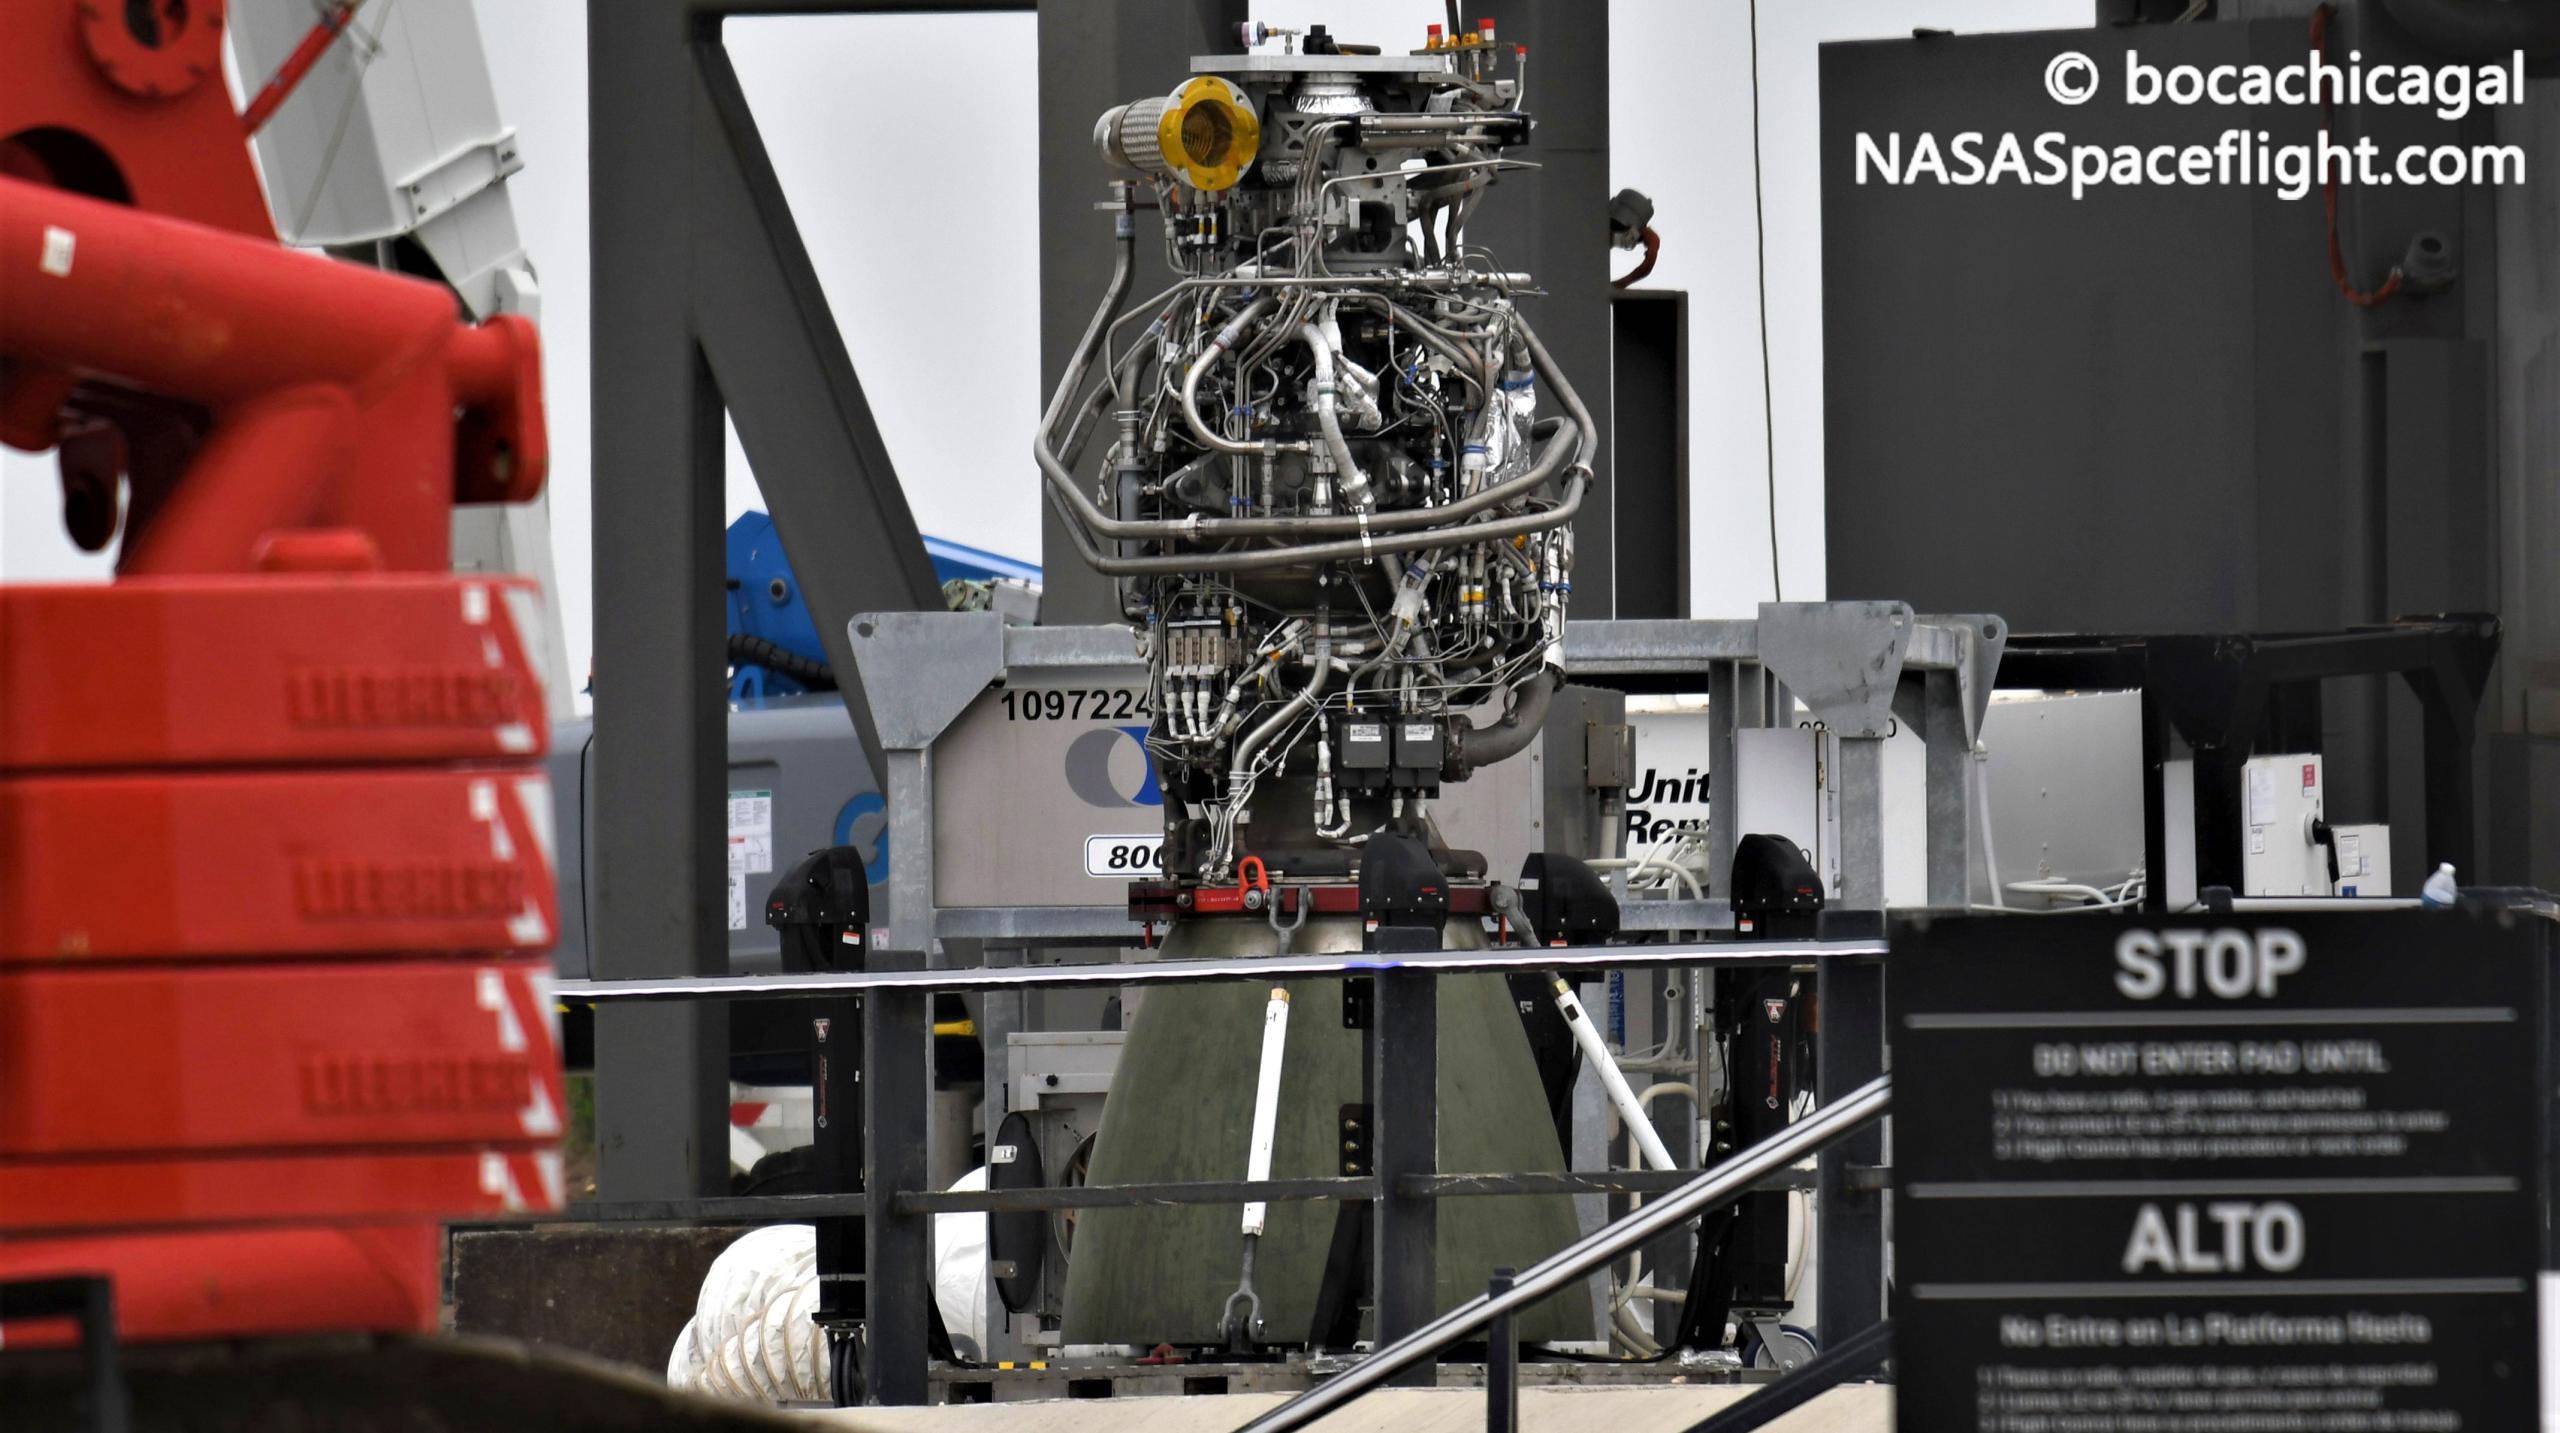 Starship Boca Chica 071121 (NASASpaceflight – bocachicagal) B3 Raptors 1 (c)